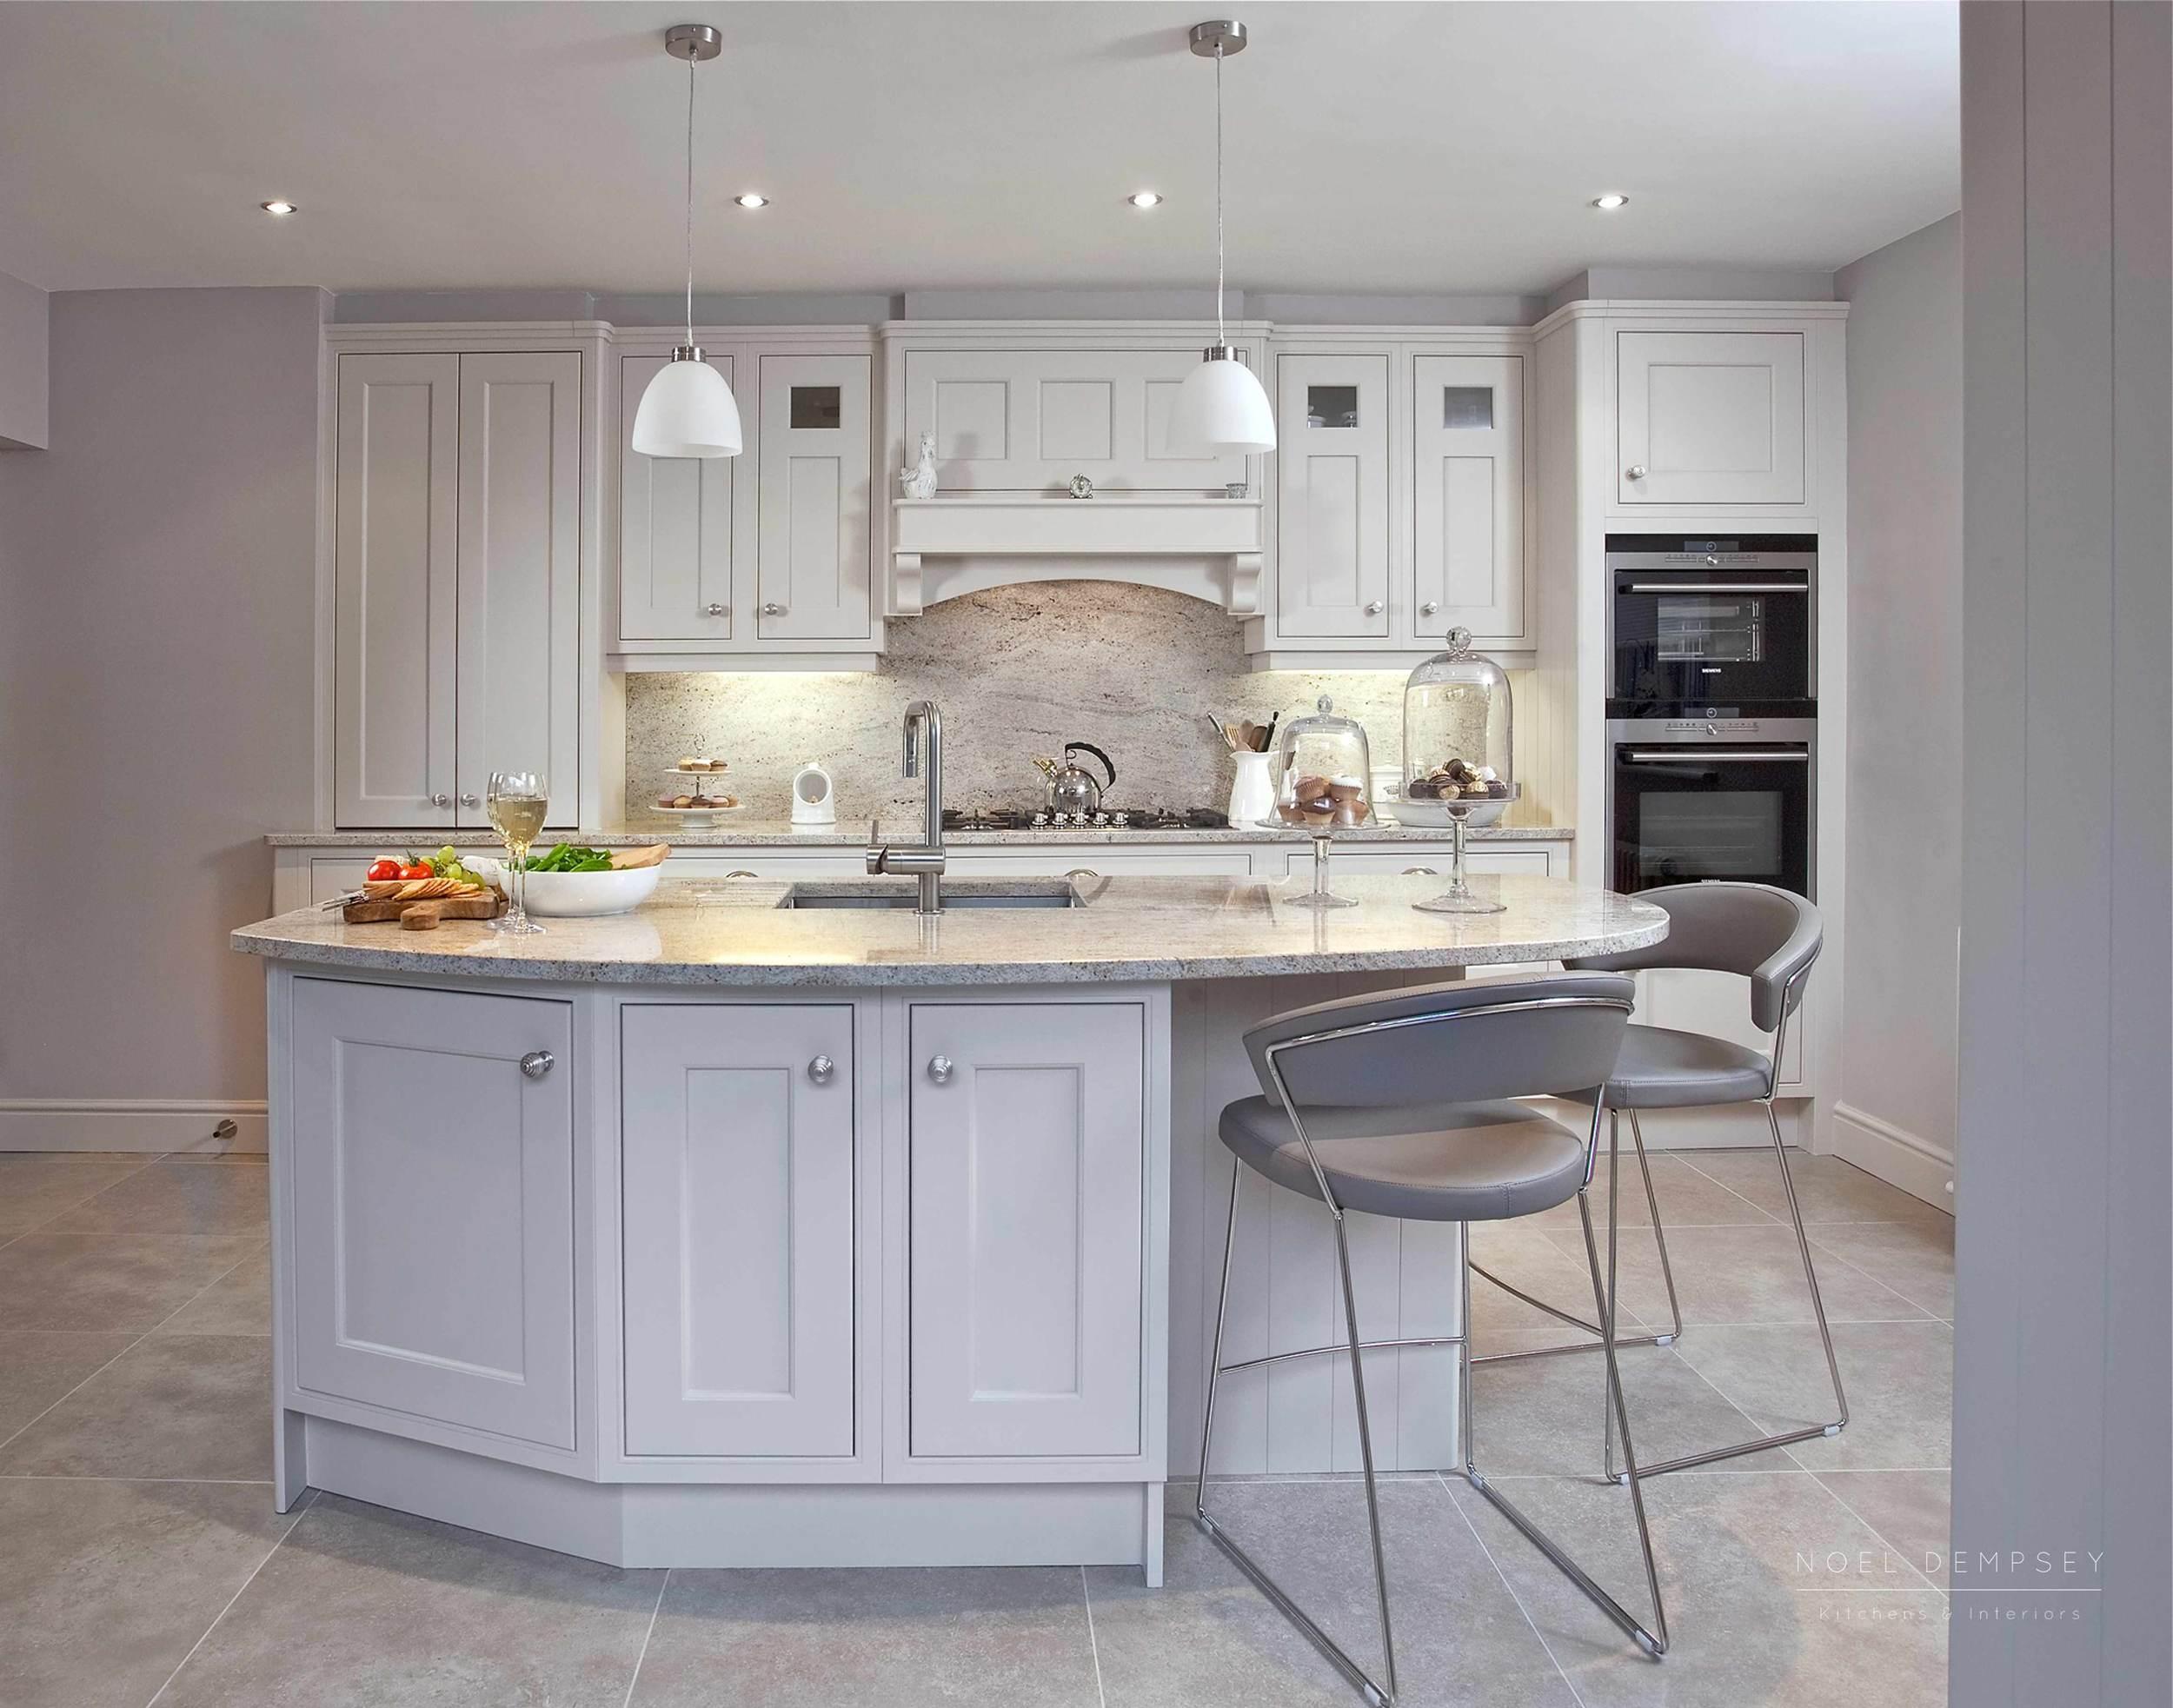 Pemberton-inframe-kitchen-2.jpg